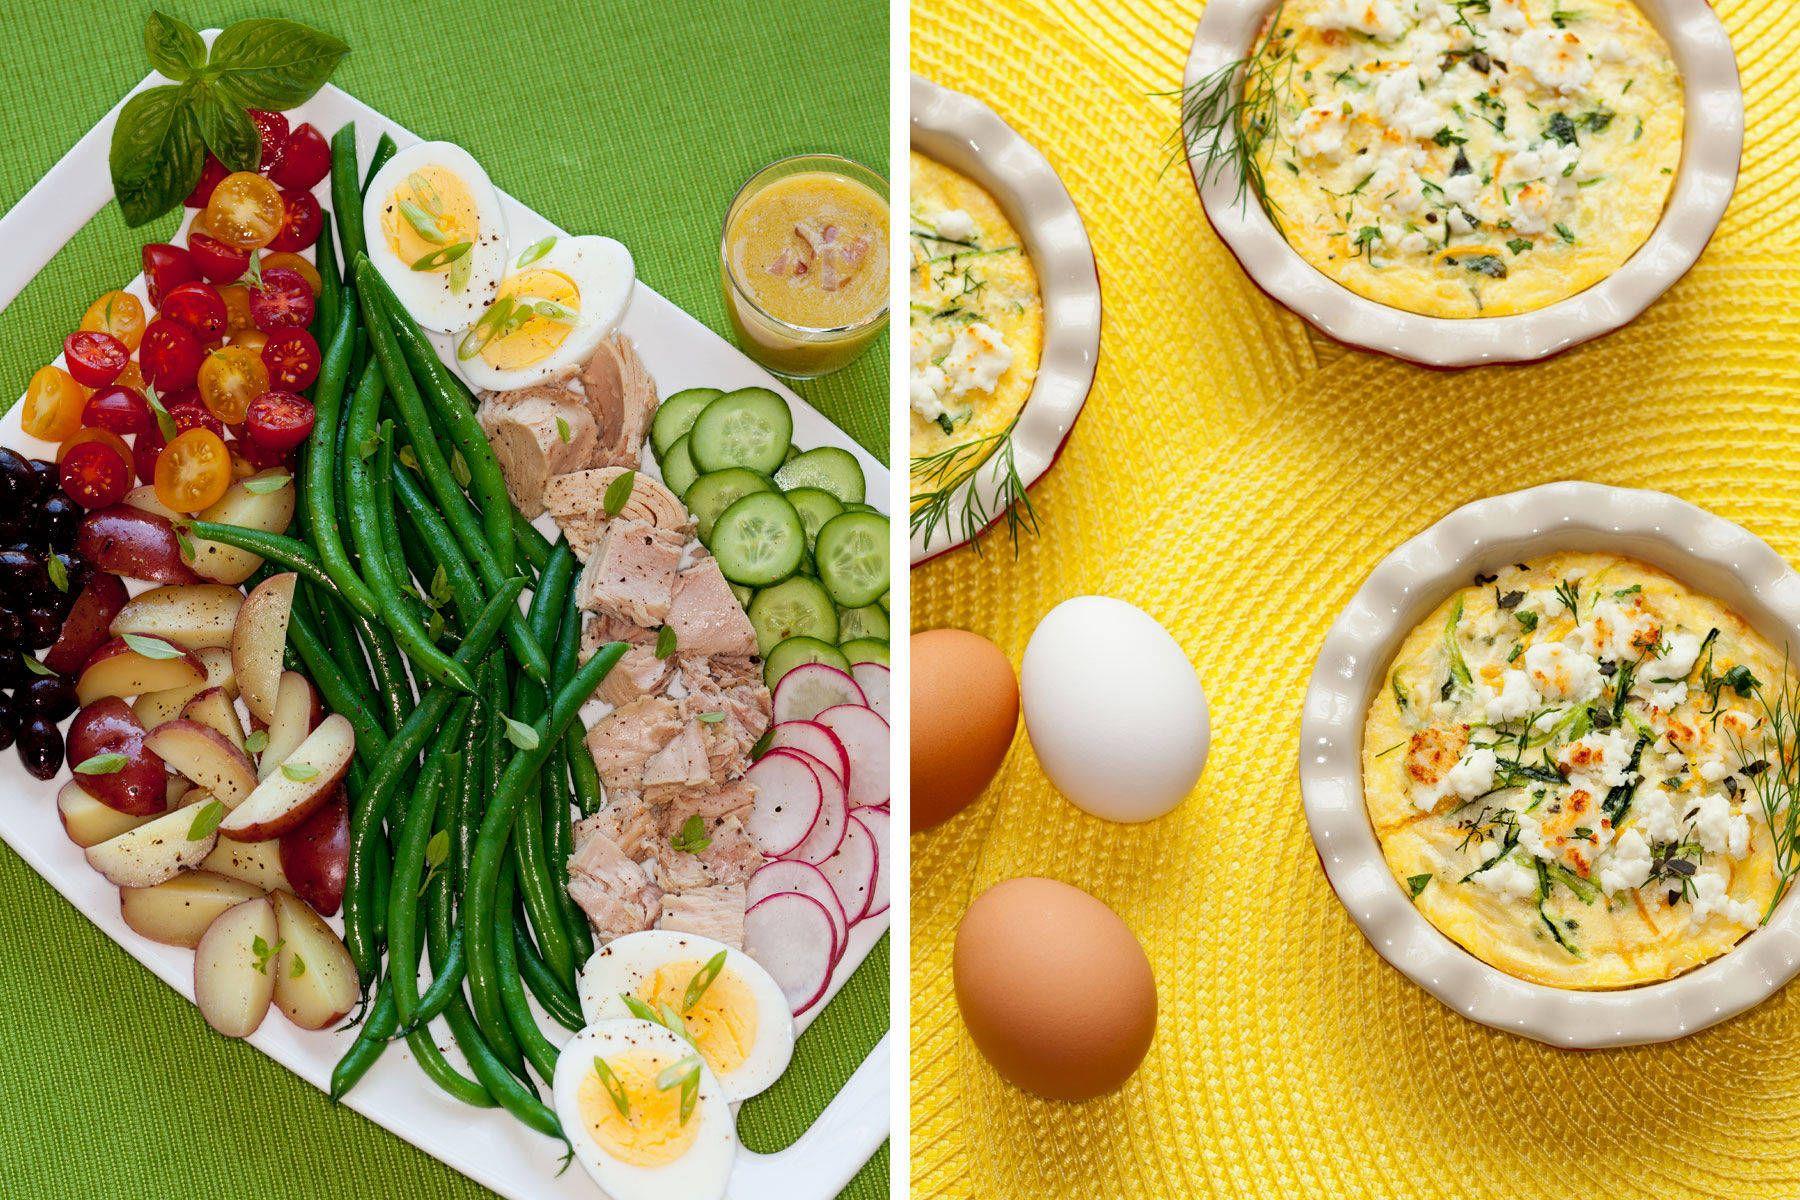 Nicoise Salad and Quiche.